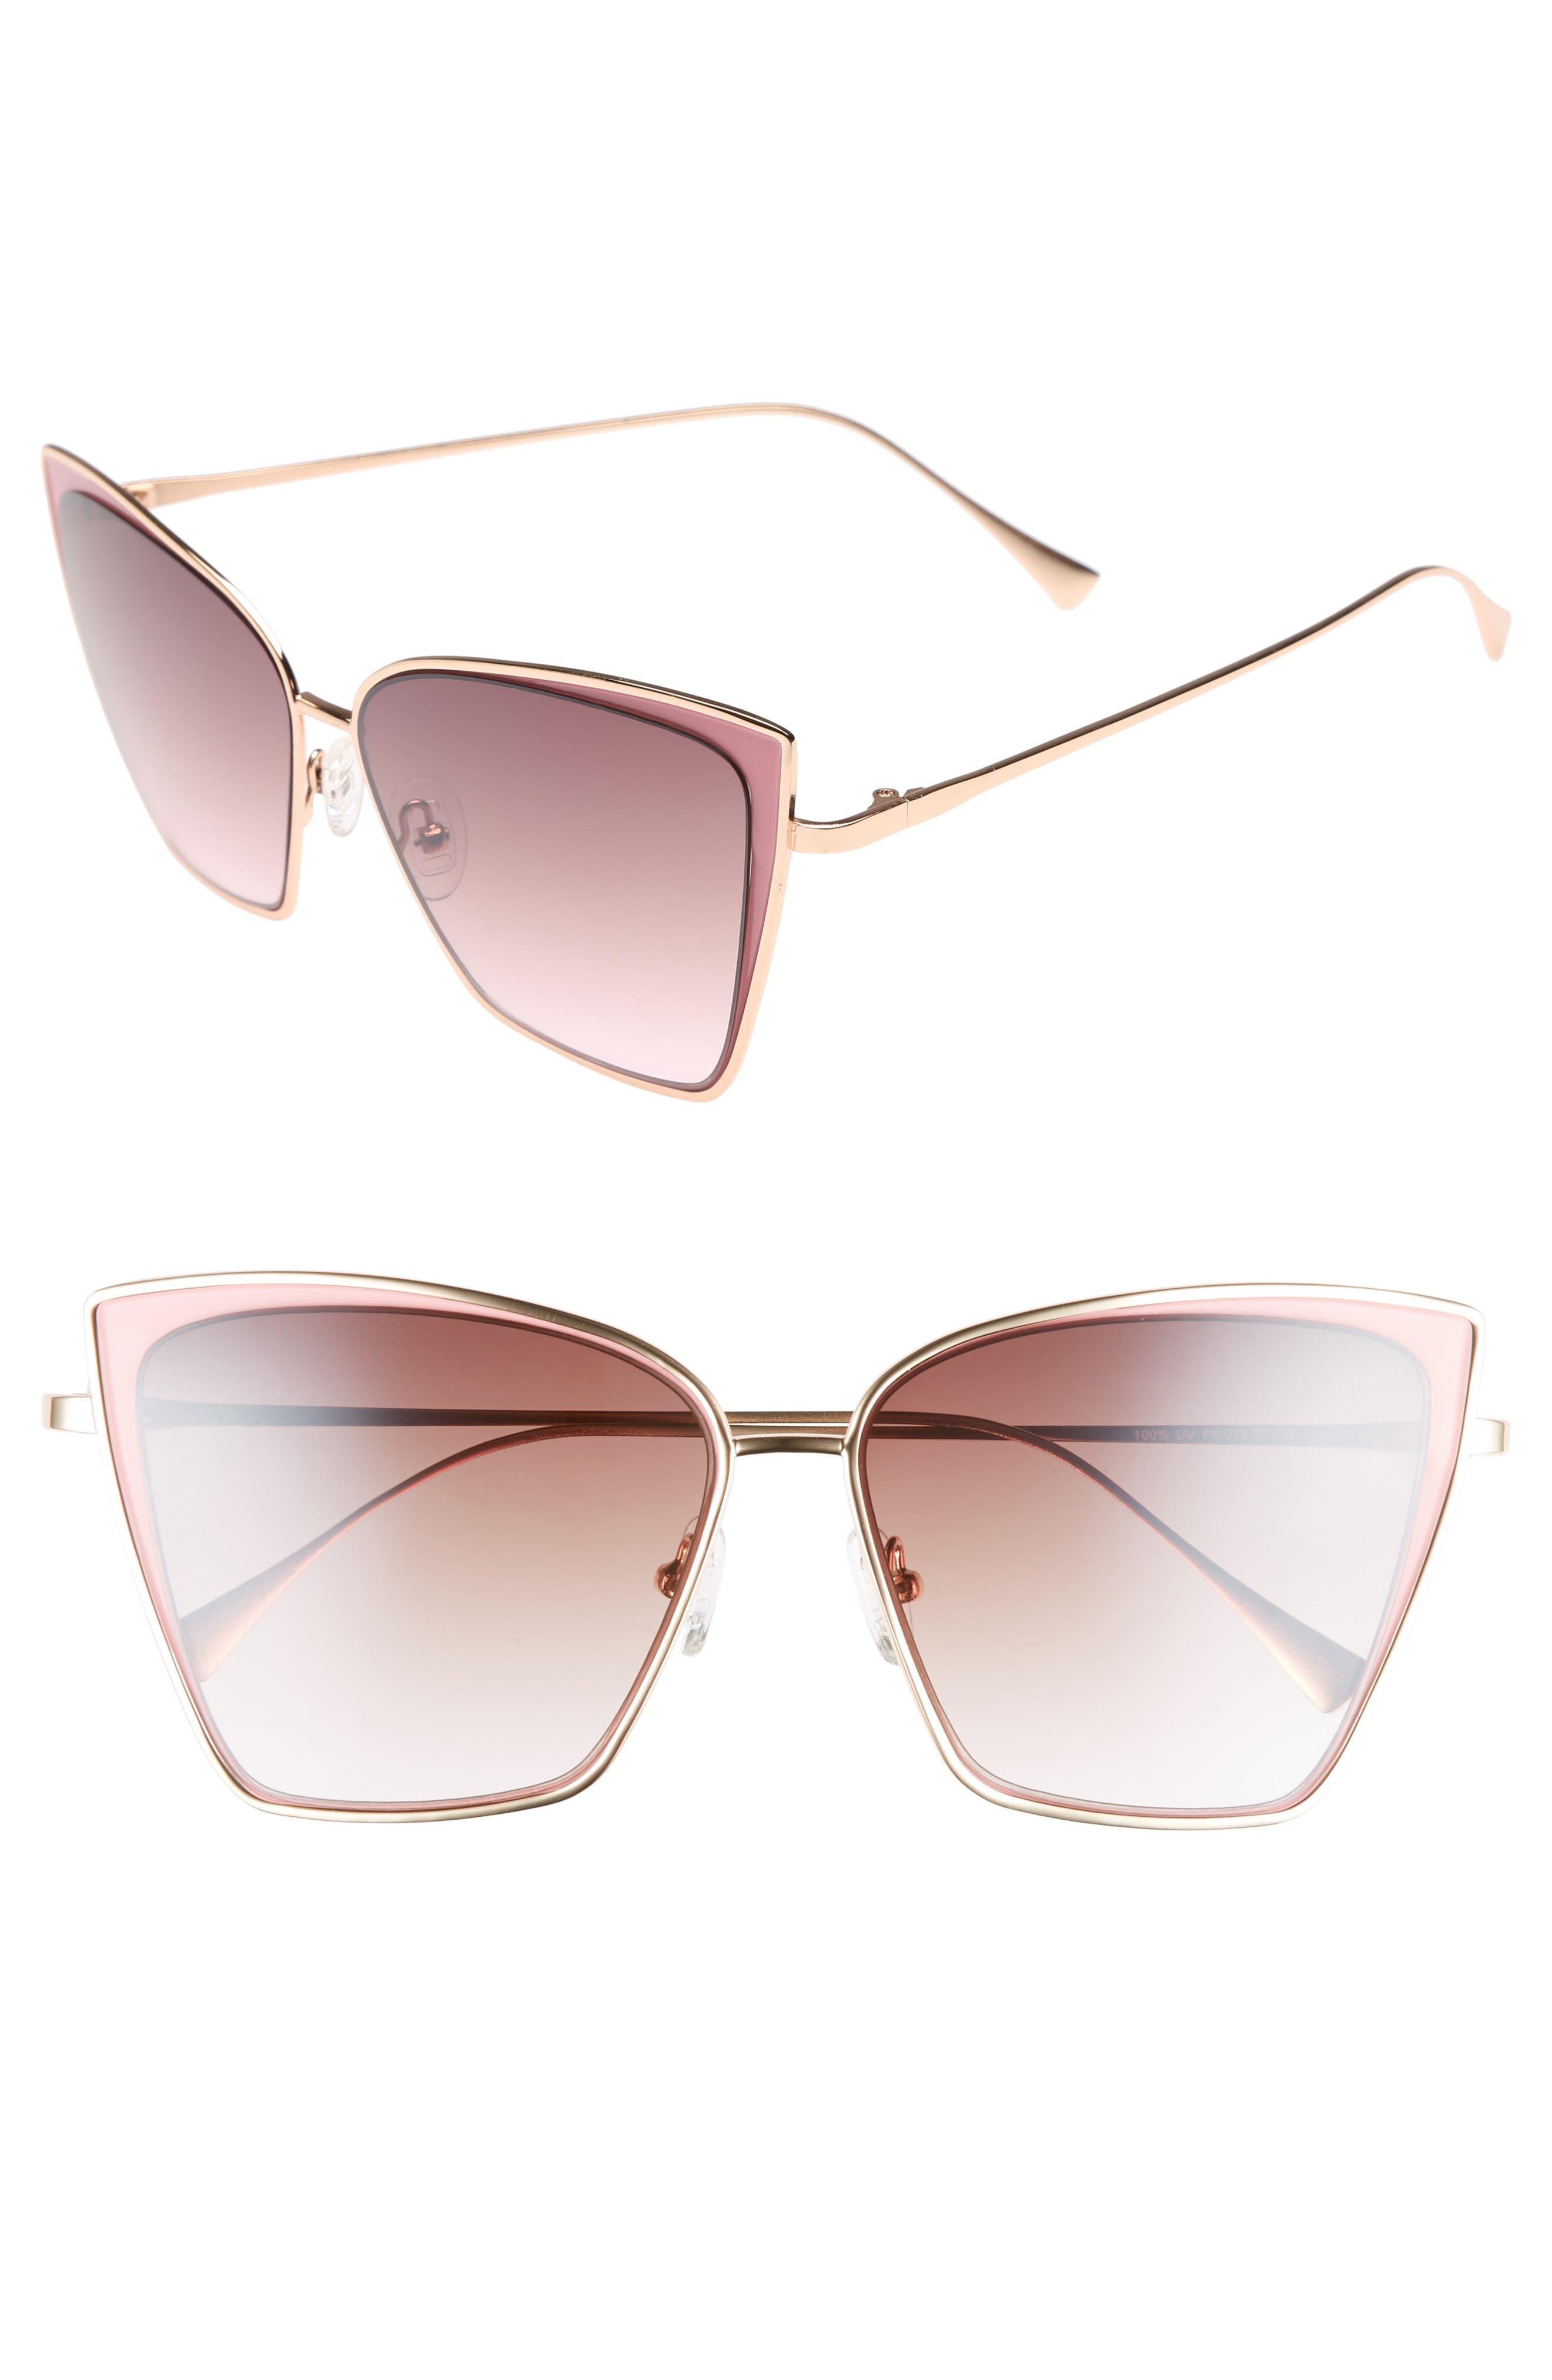 Pinkaboo 58mm Sunglasses,                         Main,                         color, Pink